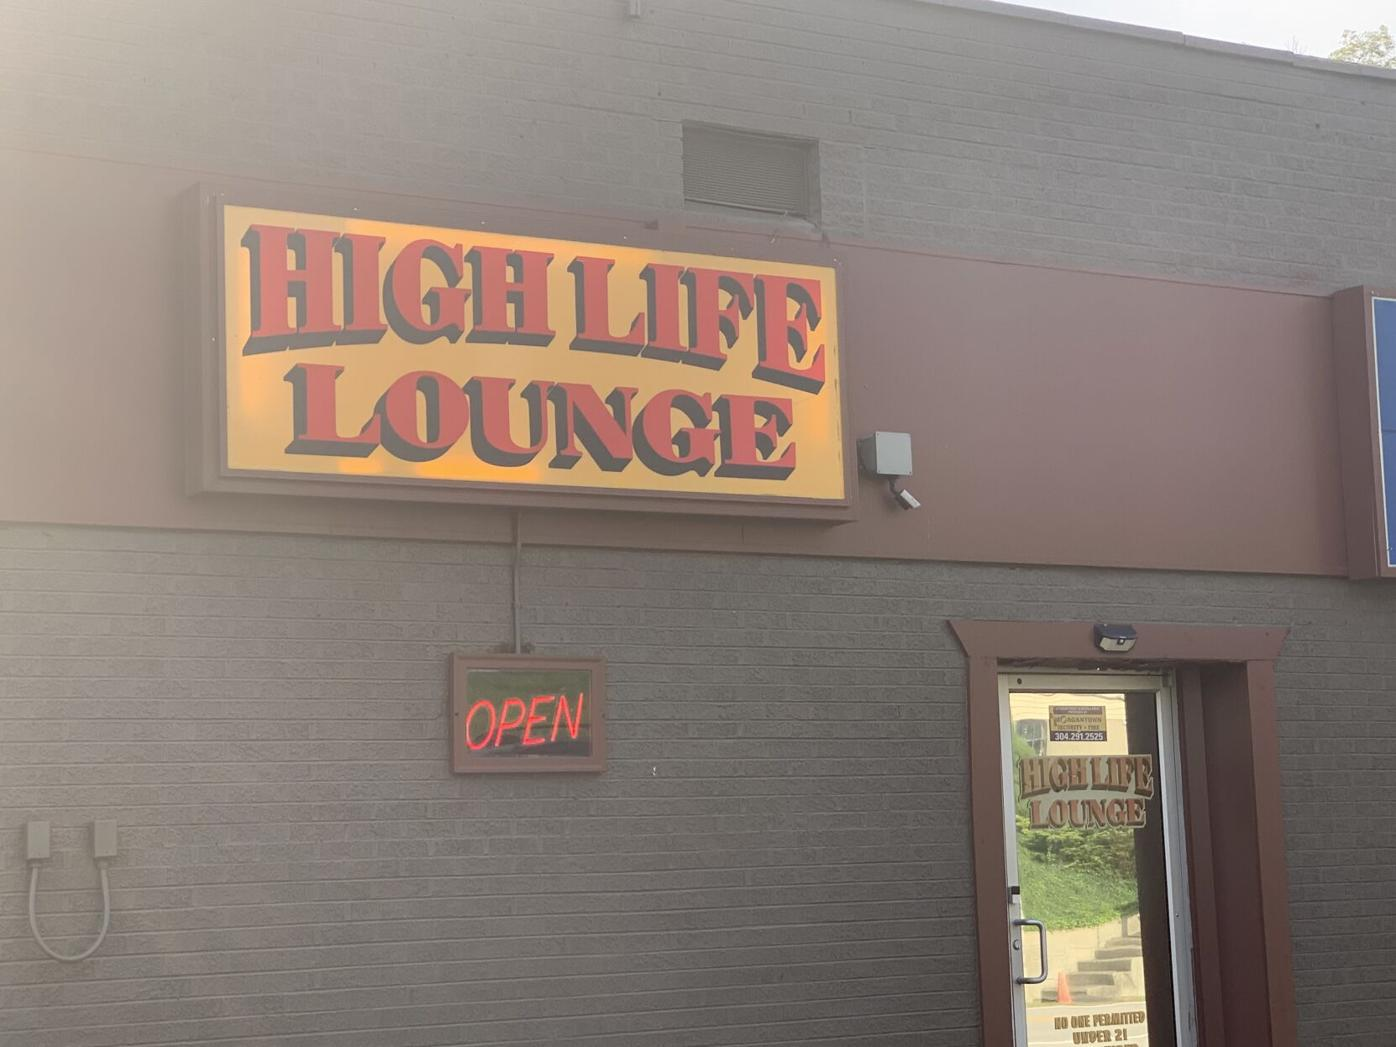 High Life Lounge, Rt. 19, Clarksburg